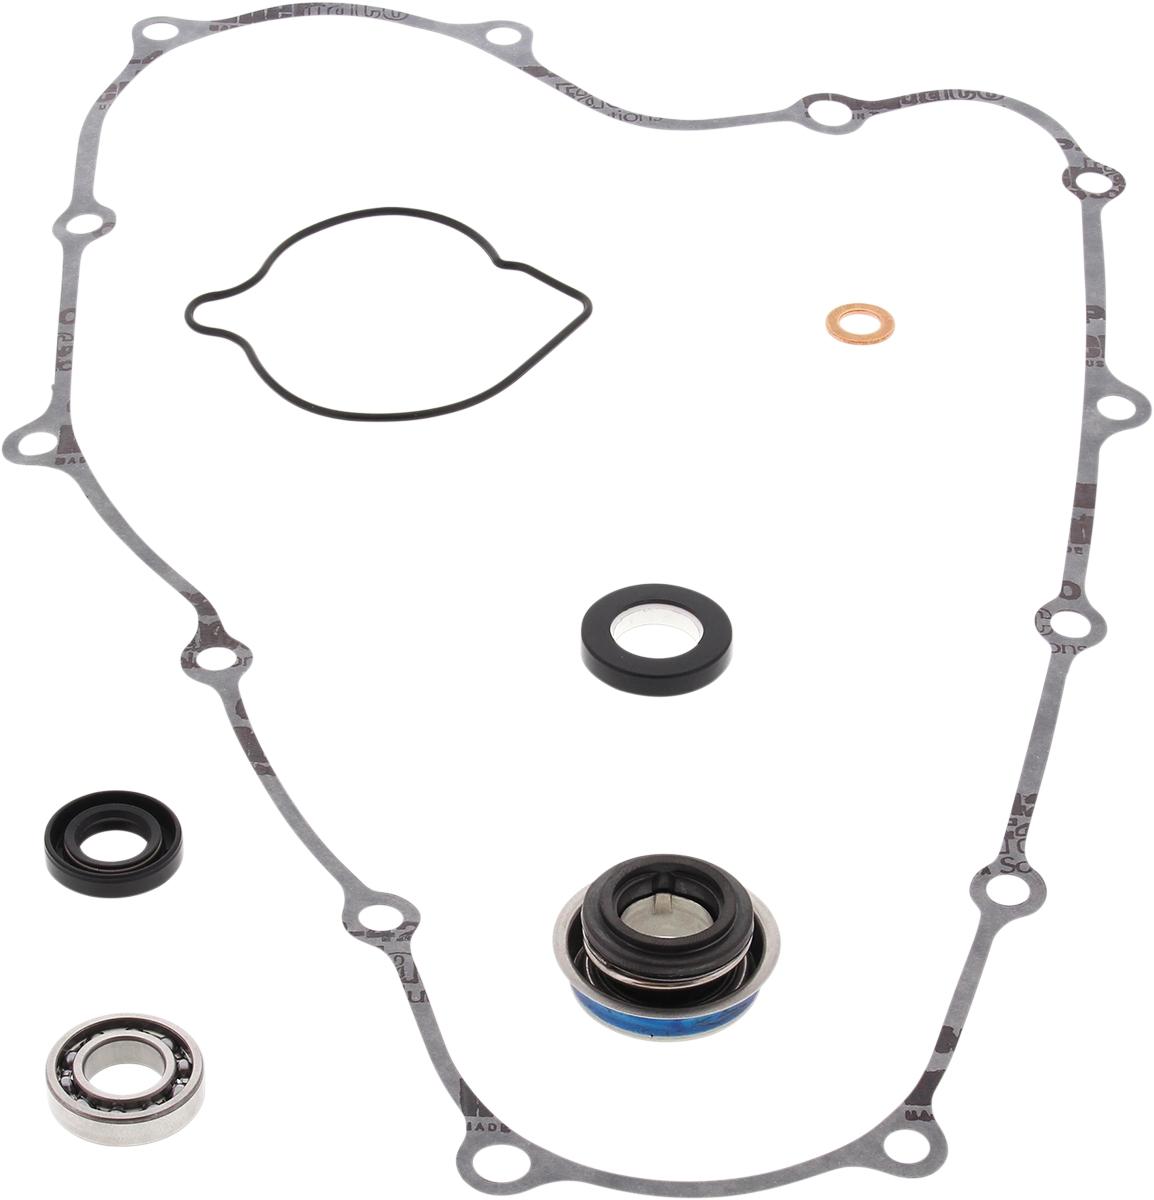 Moose Water Pump Kit 02-15 KFX700 KVF650 KVF700 KVF750